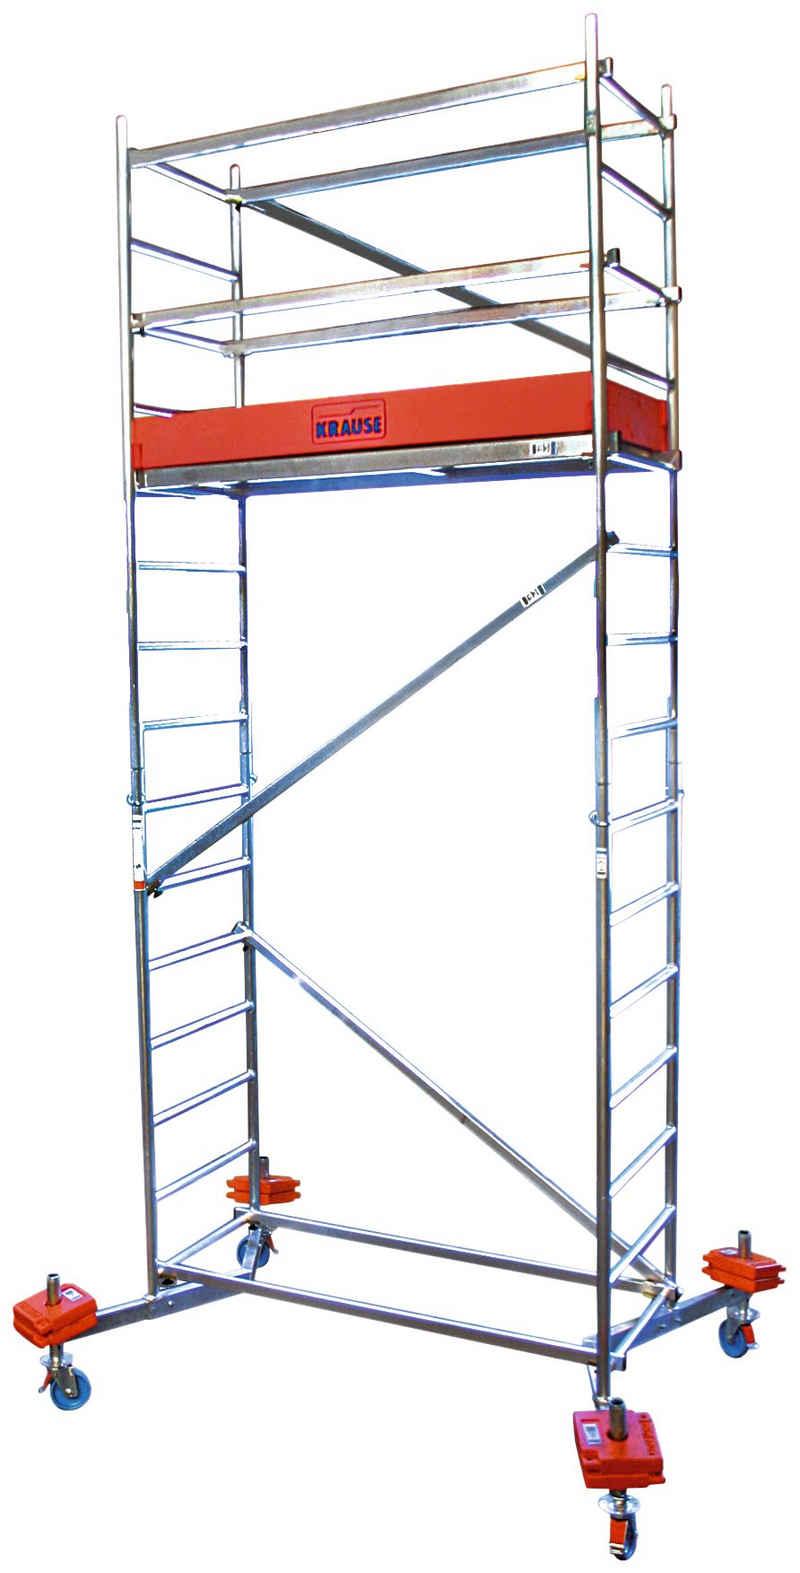 KRAUSE Fahrgerüst »Climtec«, Max. Arbeitshöhe: 5 m, Standhöhe: 3 m